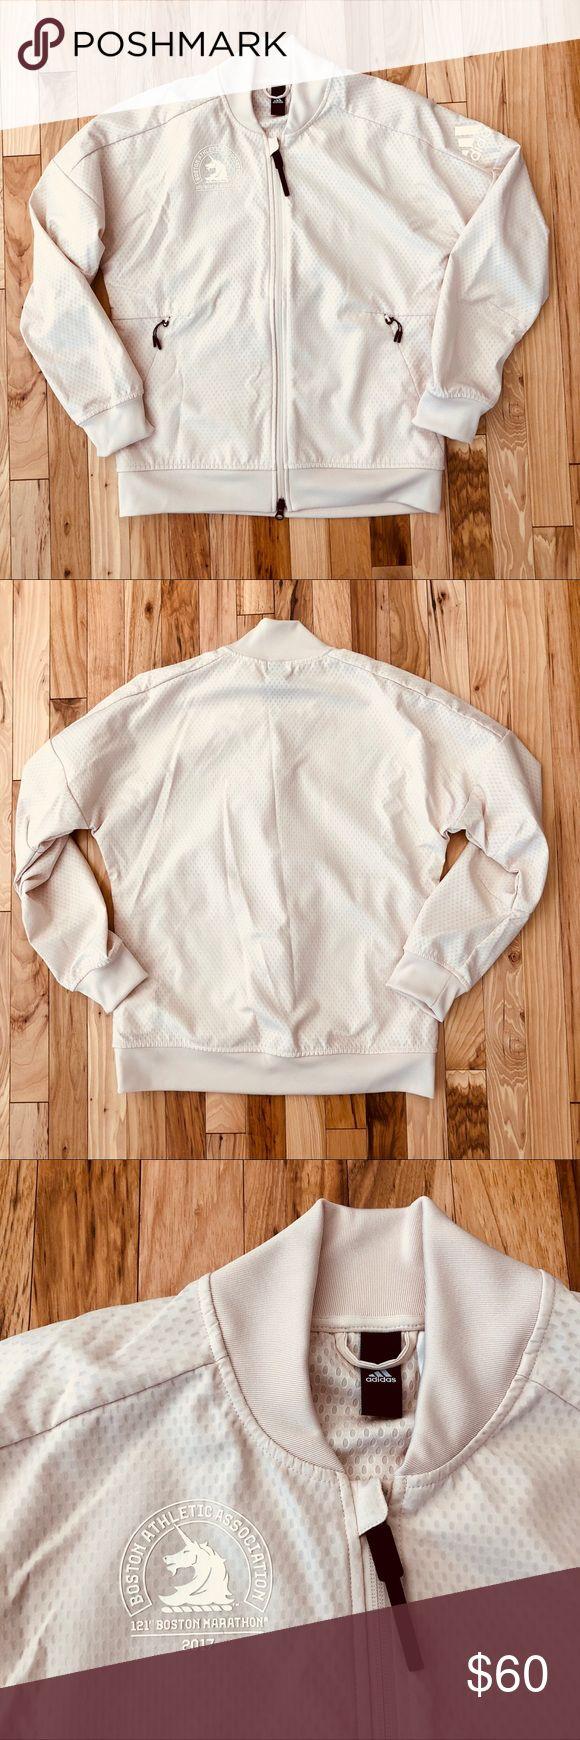 Adidas 2017 Boston Marathon jacket (M10) Very good pre-owned condition  Gently worn   Smoke-free home adidas Jackets & Coats